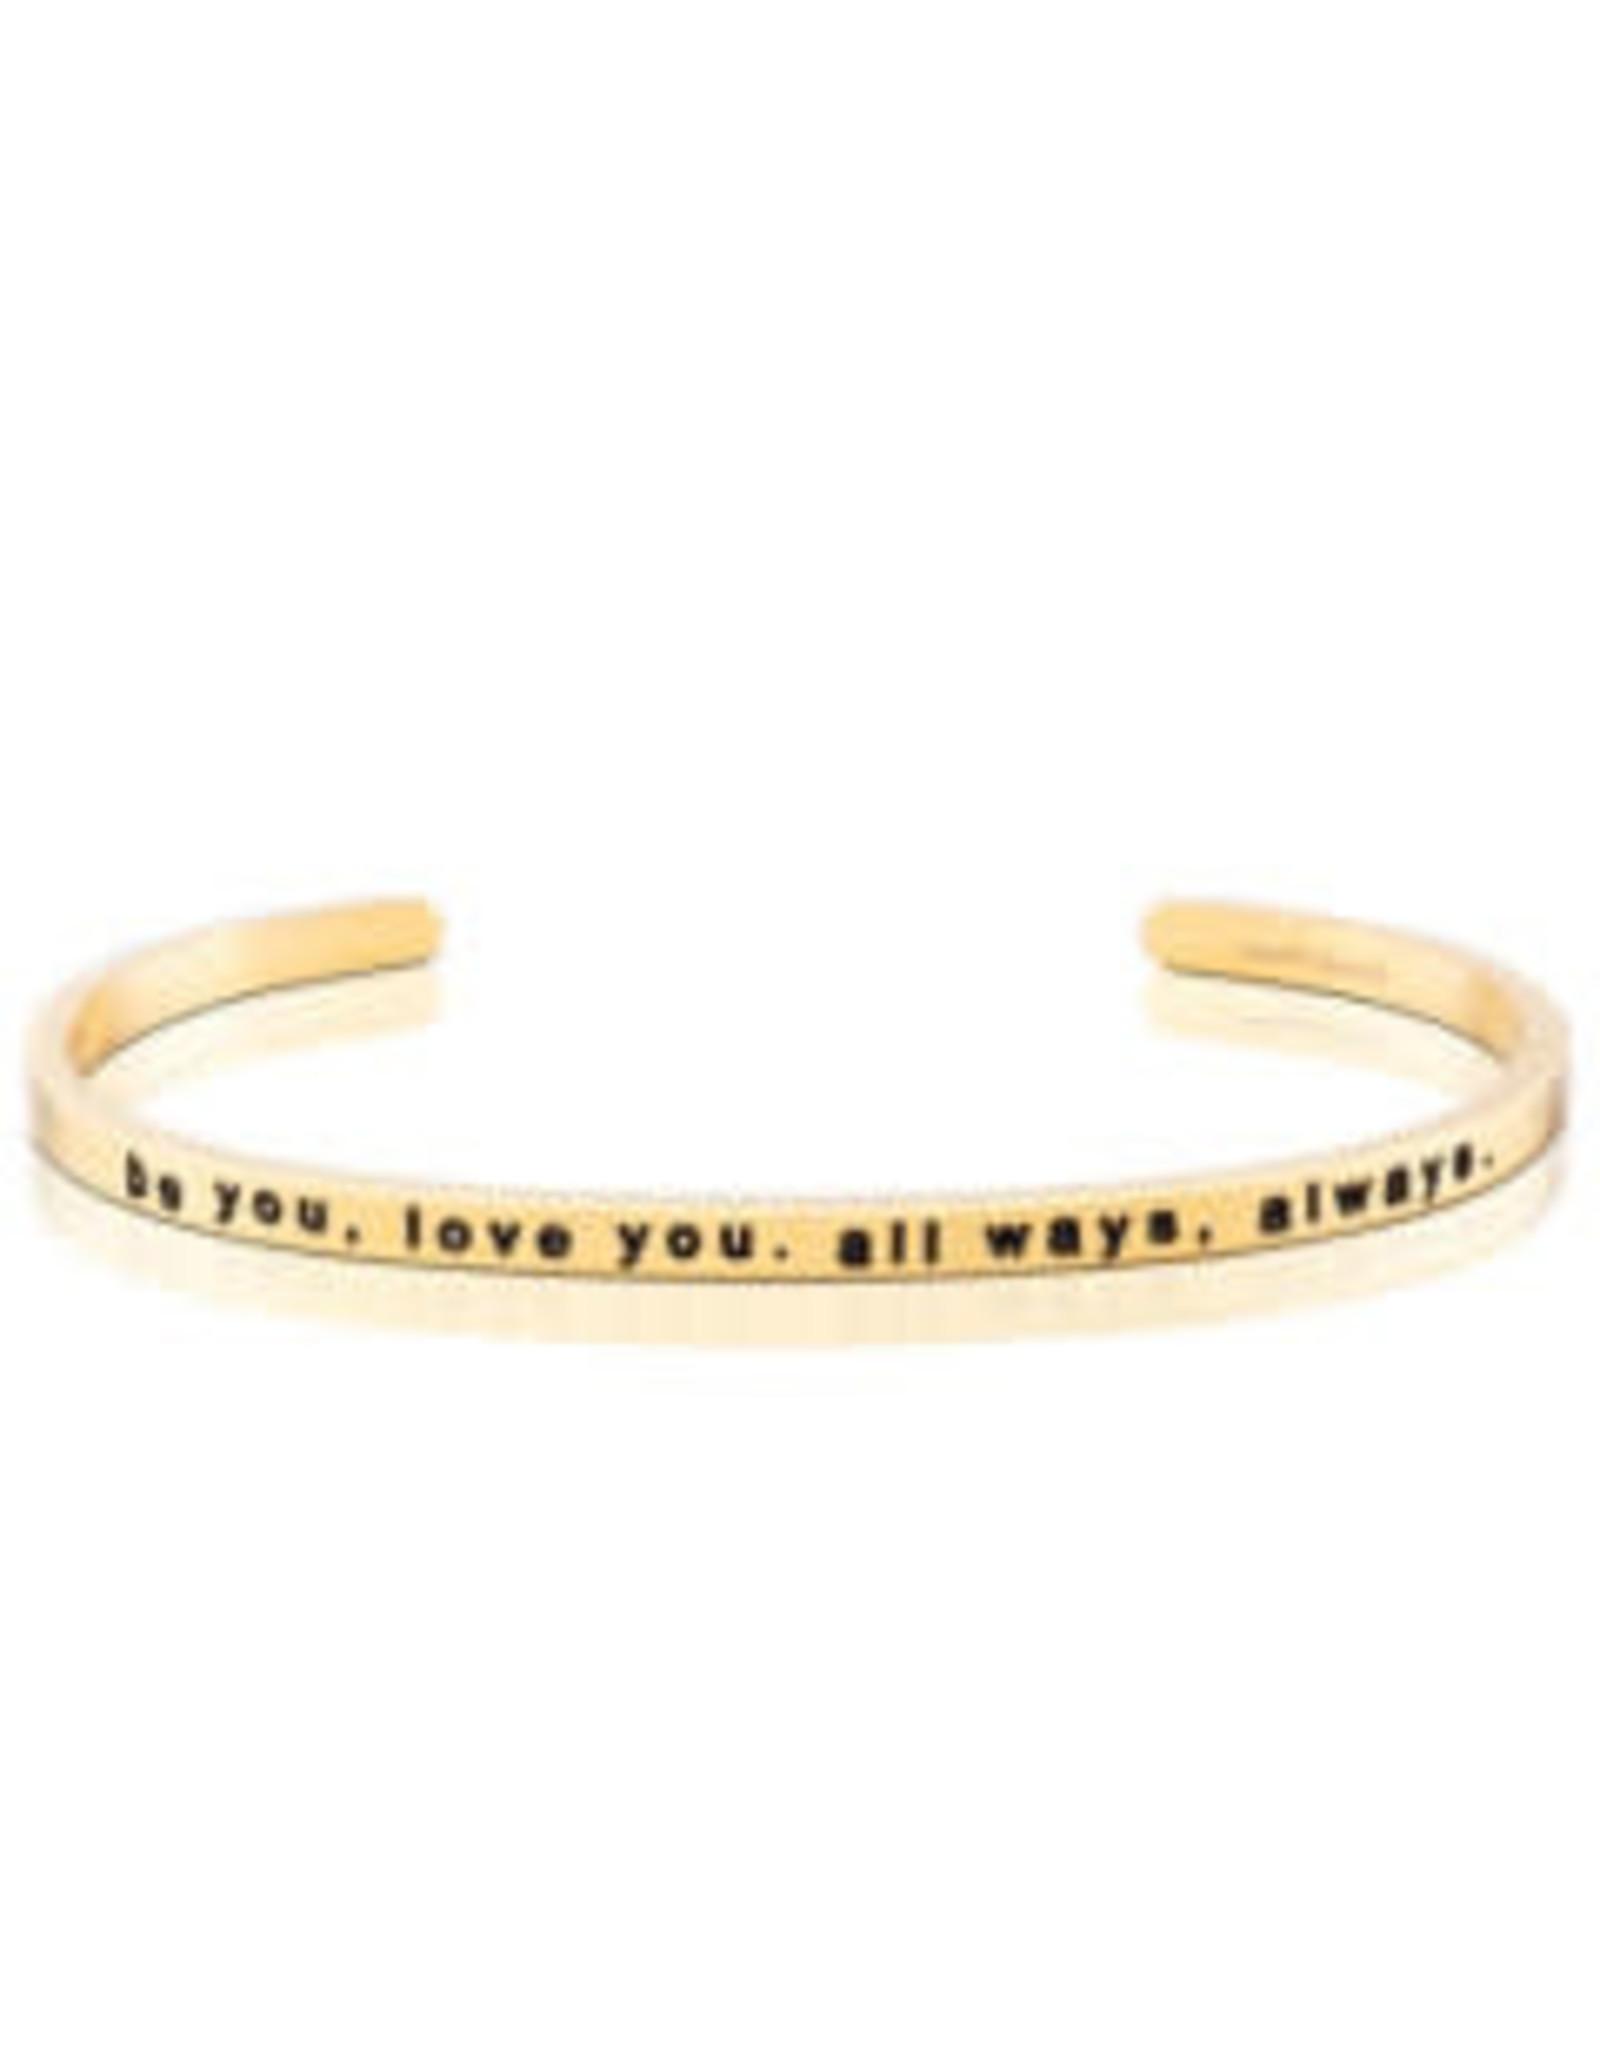 MantraBand MantraBand Bracelet Be You Love You All Ways